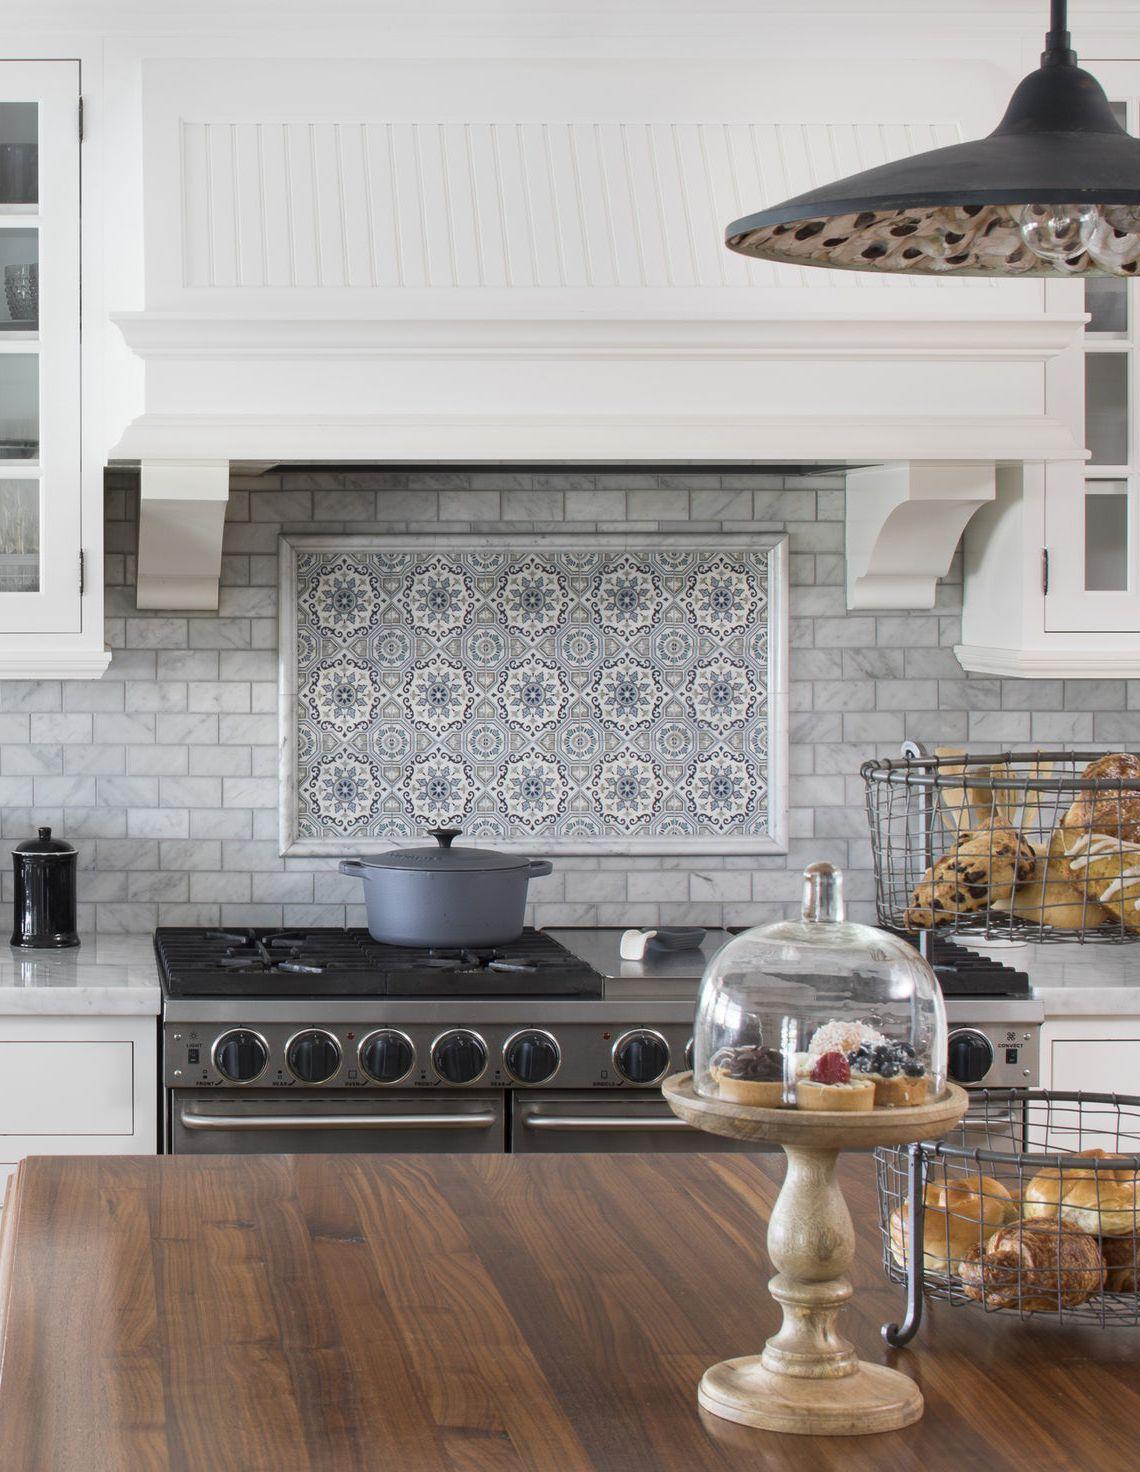 Kitchen Backsplash Ideas The Sanza Collection Kitchen Backsplash Designs Coastal Kitchen Simple Kitchen